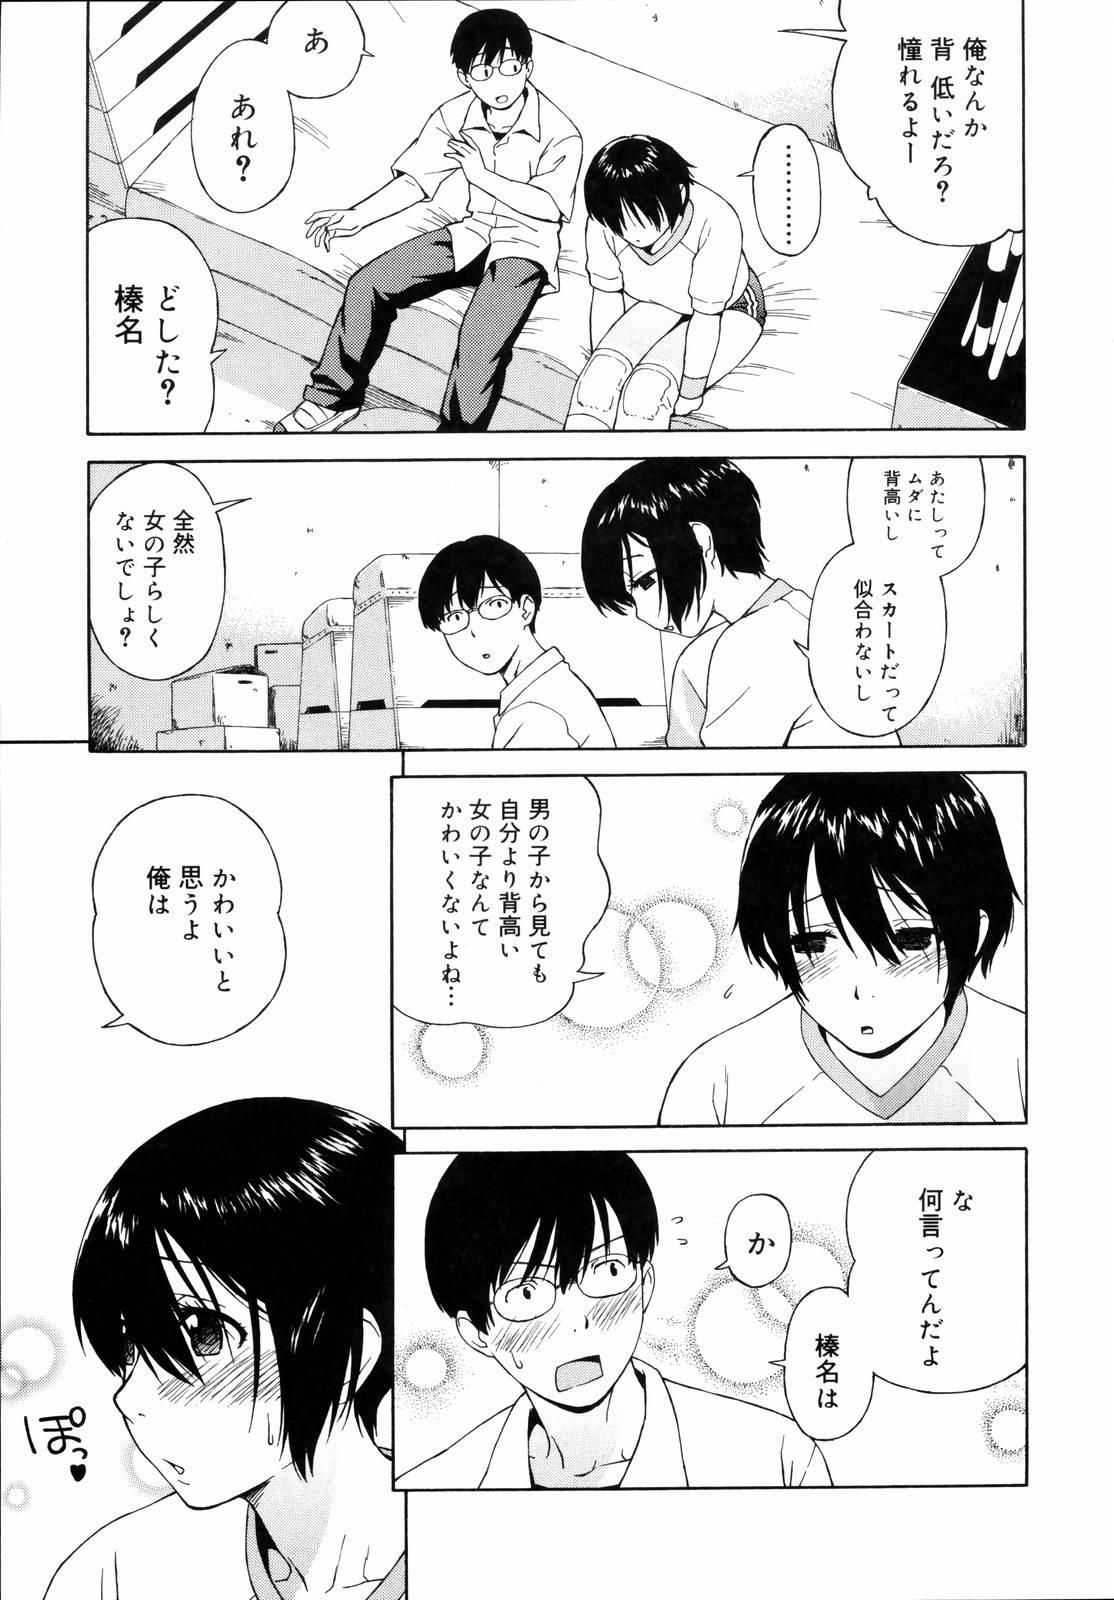 Shishunki wa Hatsujouki - Adolescence is a sexual excitement period. 10